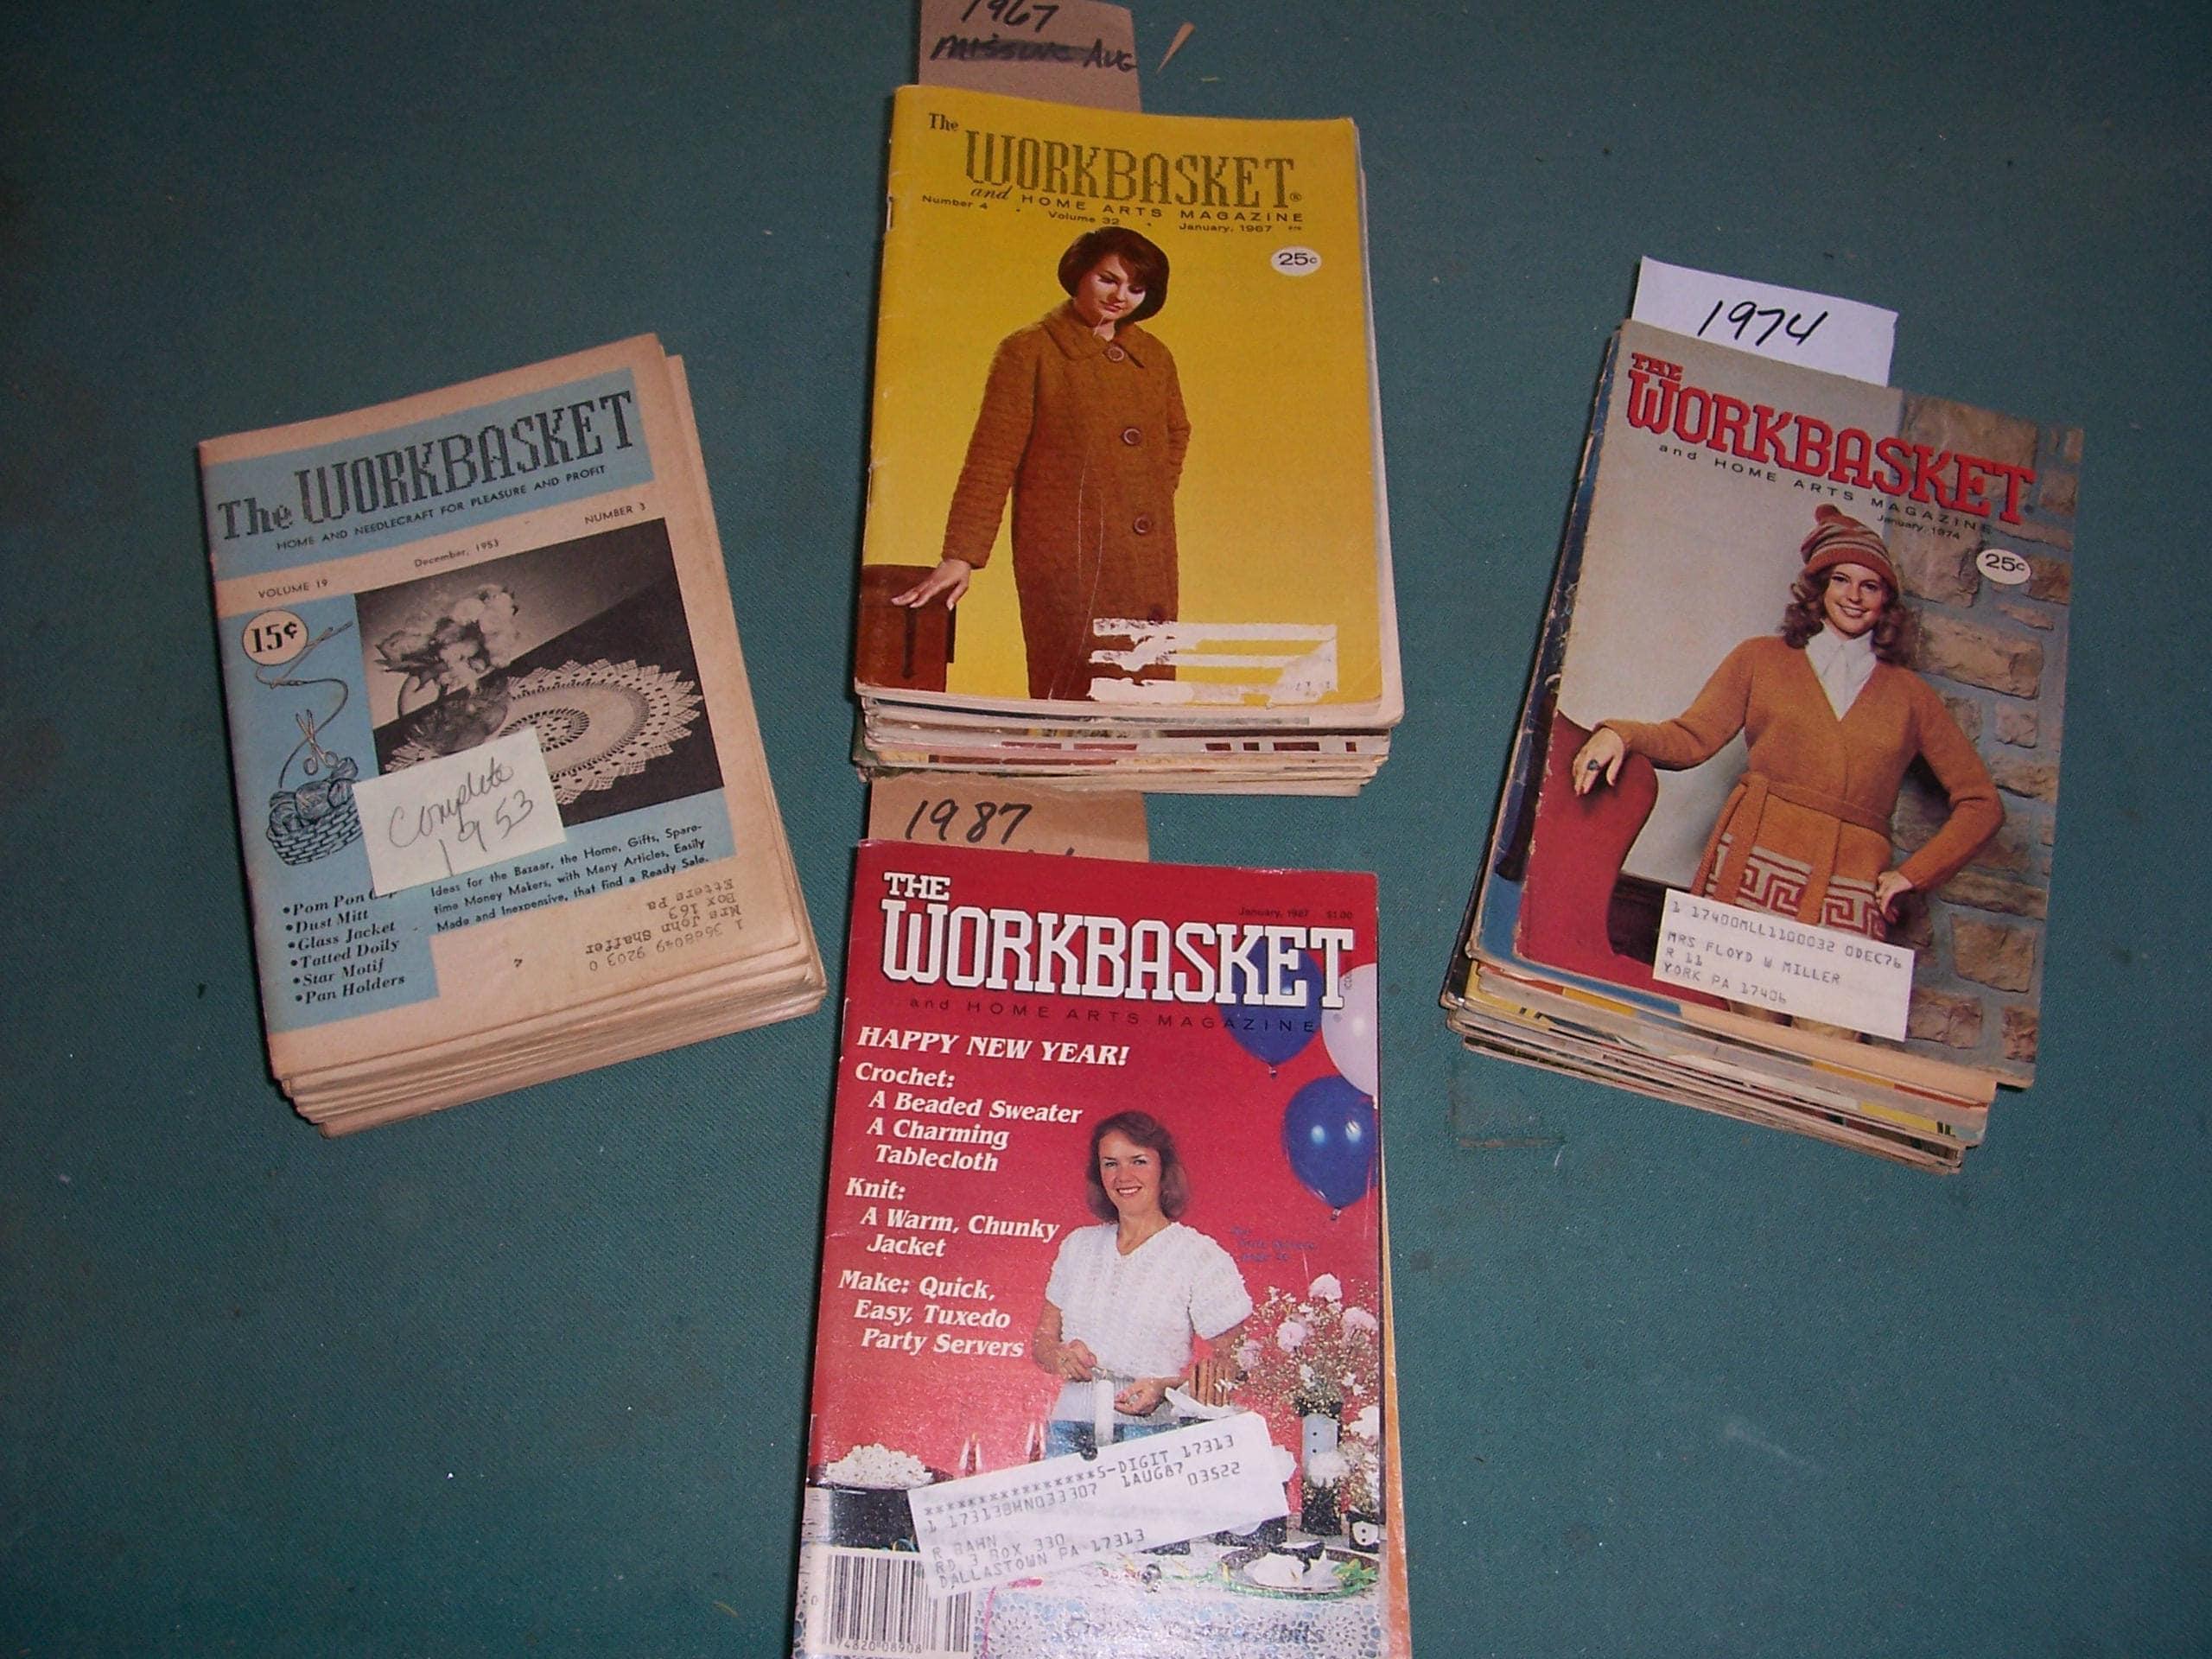 Vintage 1953196719681974 or 1987 workbasket magazines sold by mirandasroom bankloansurffo Choice Image